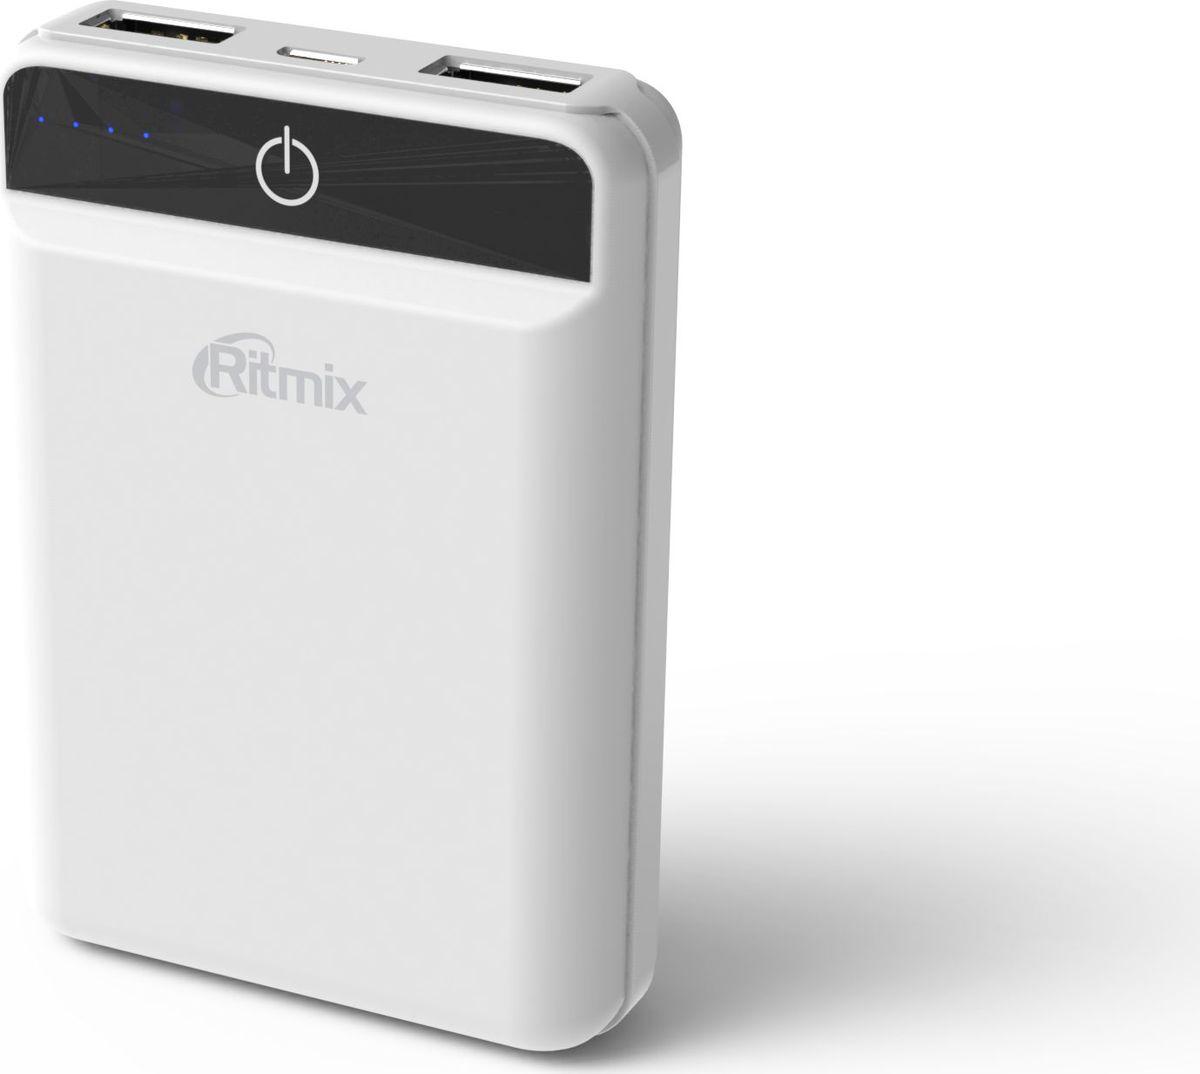 Ritmix RPB-10003L, White внешний аккумулятор (10000 мАч) ritmix rpb 12077p silver внешний аккумулятор 12000 мач